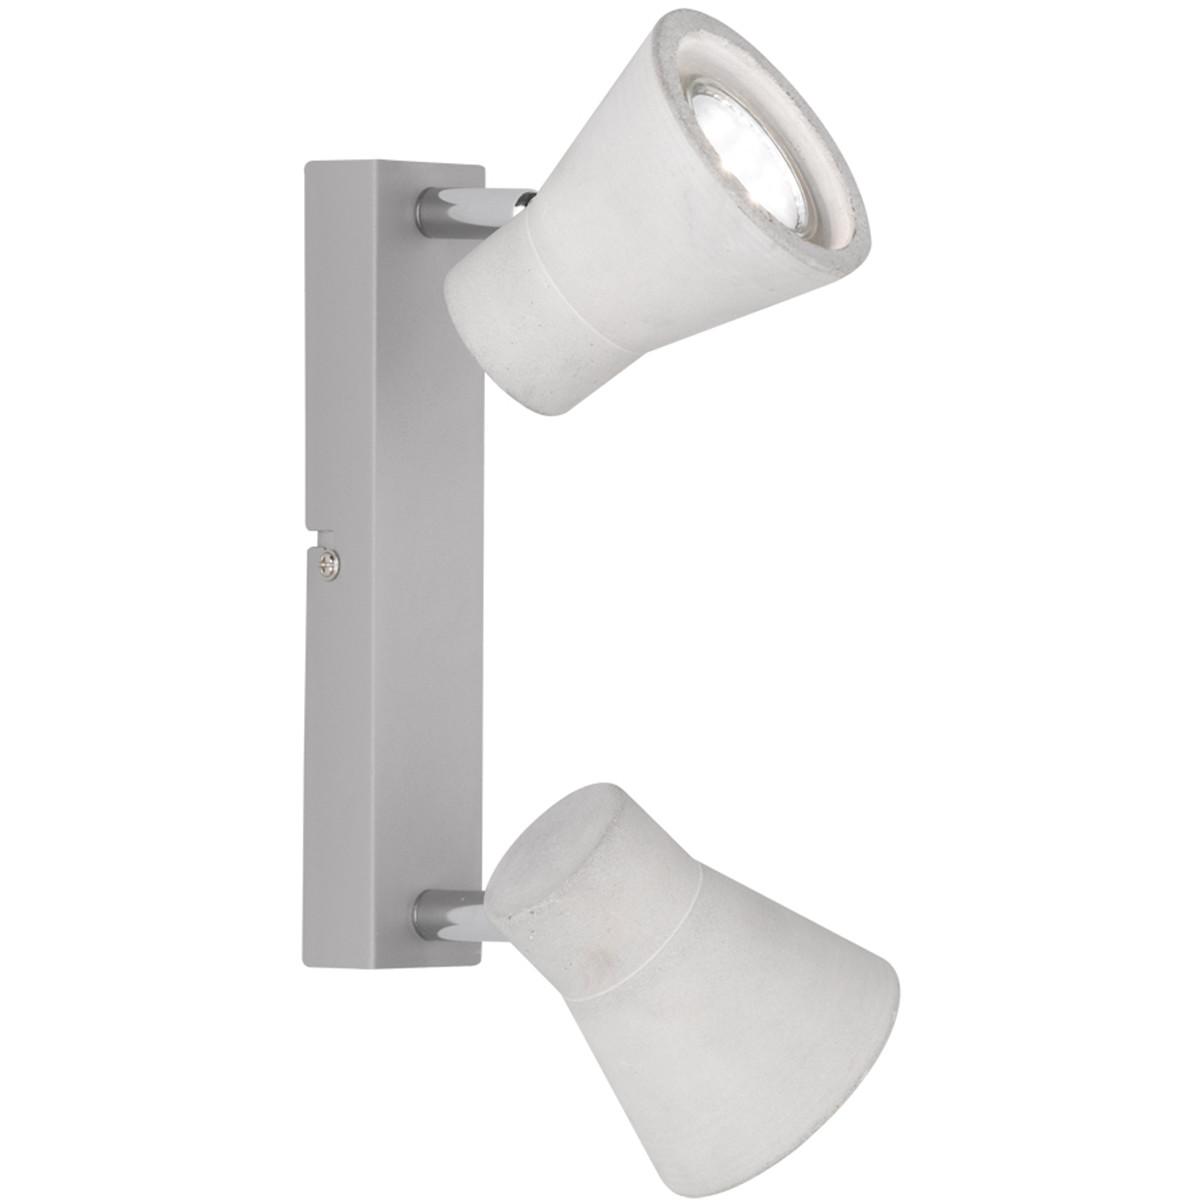 LED Plafondspot - Trion Antyna - GU10 Fitting - 6W - Warm Wit 3000K - 2-lichts - Rond - Beton Look -